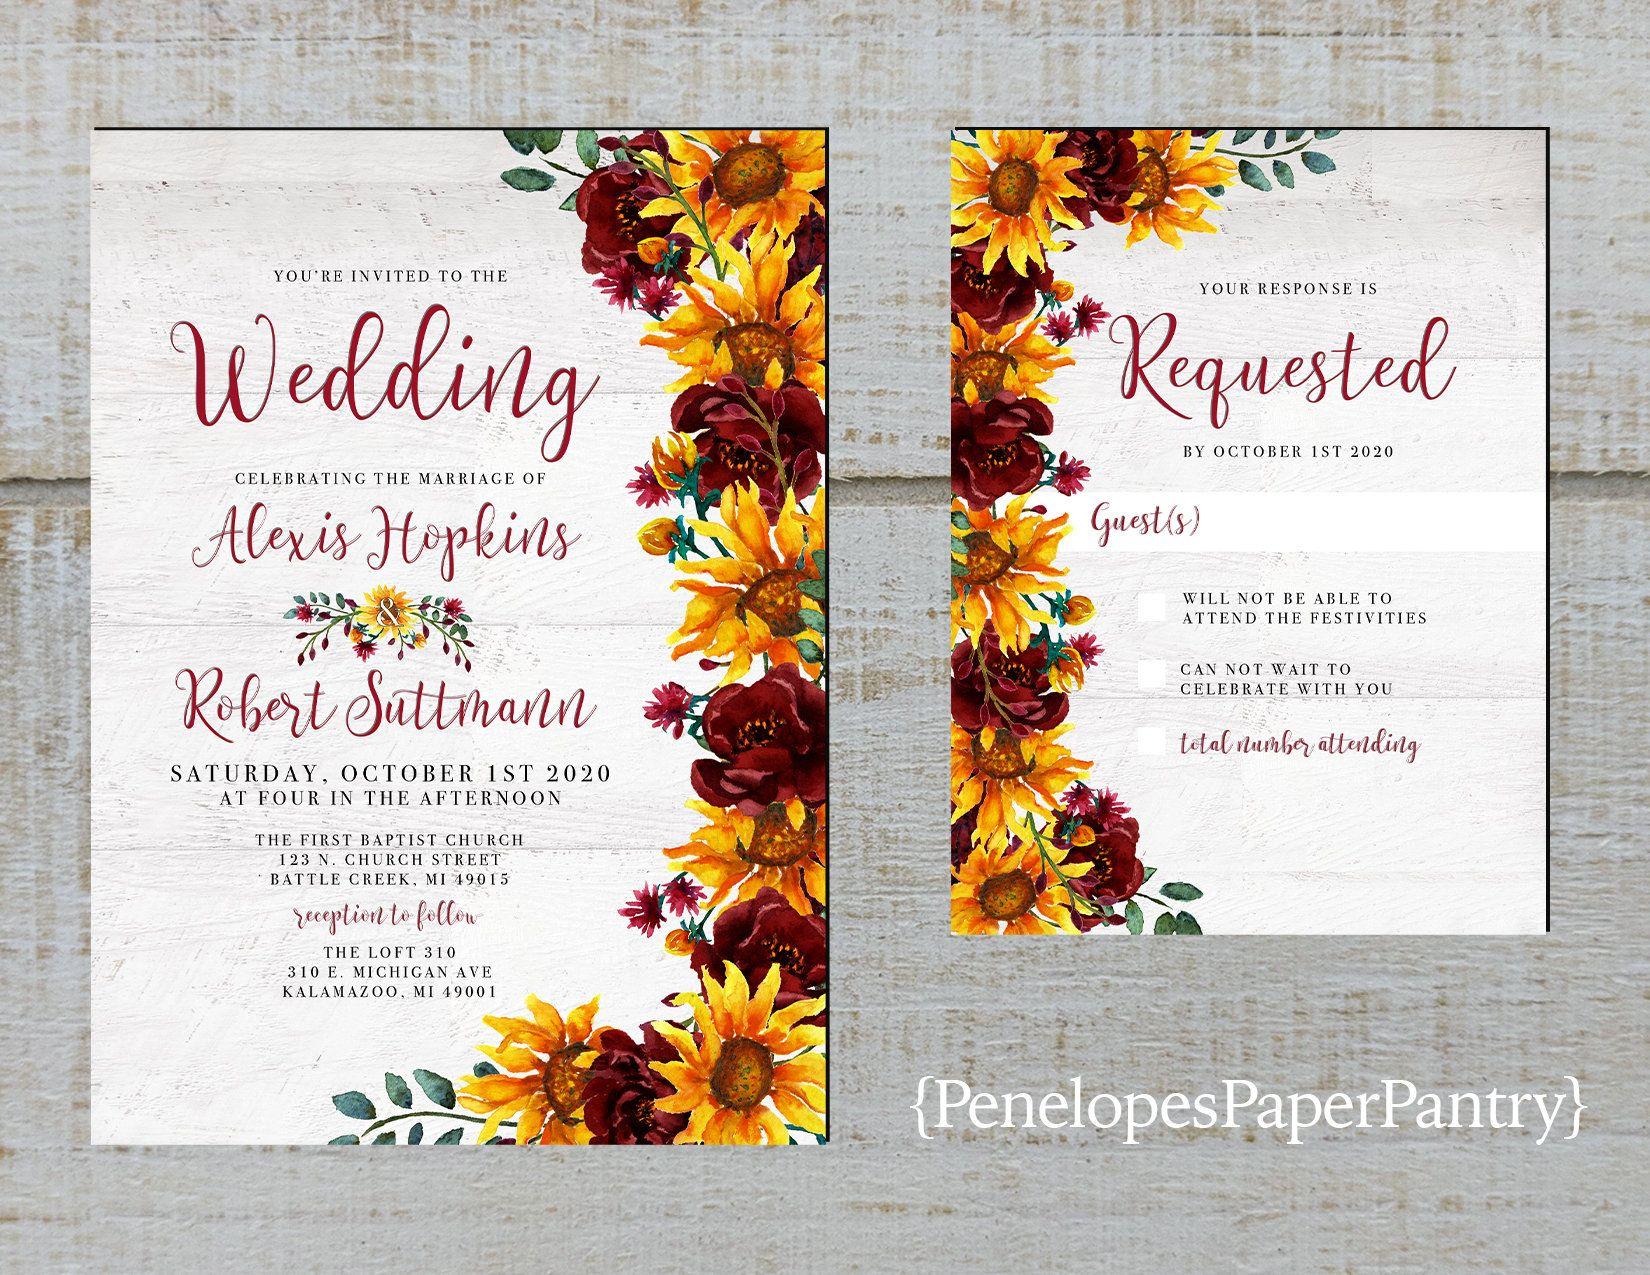 Rustic Sunflower Wedding Invitation,Sunflowers,Burgundy